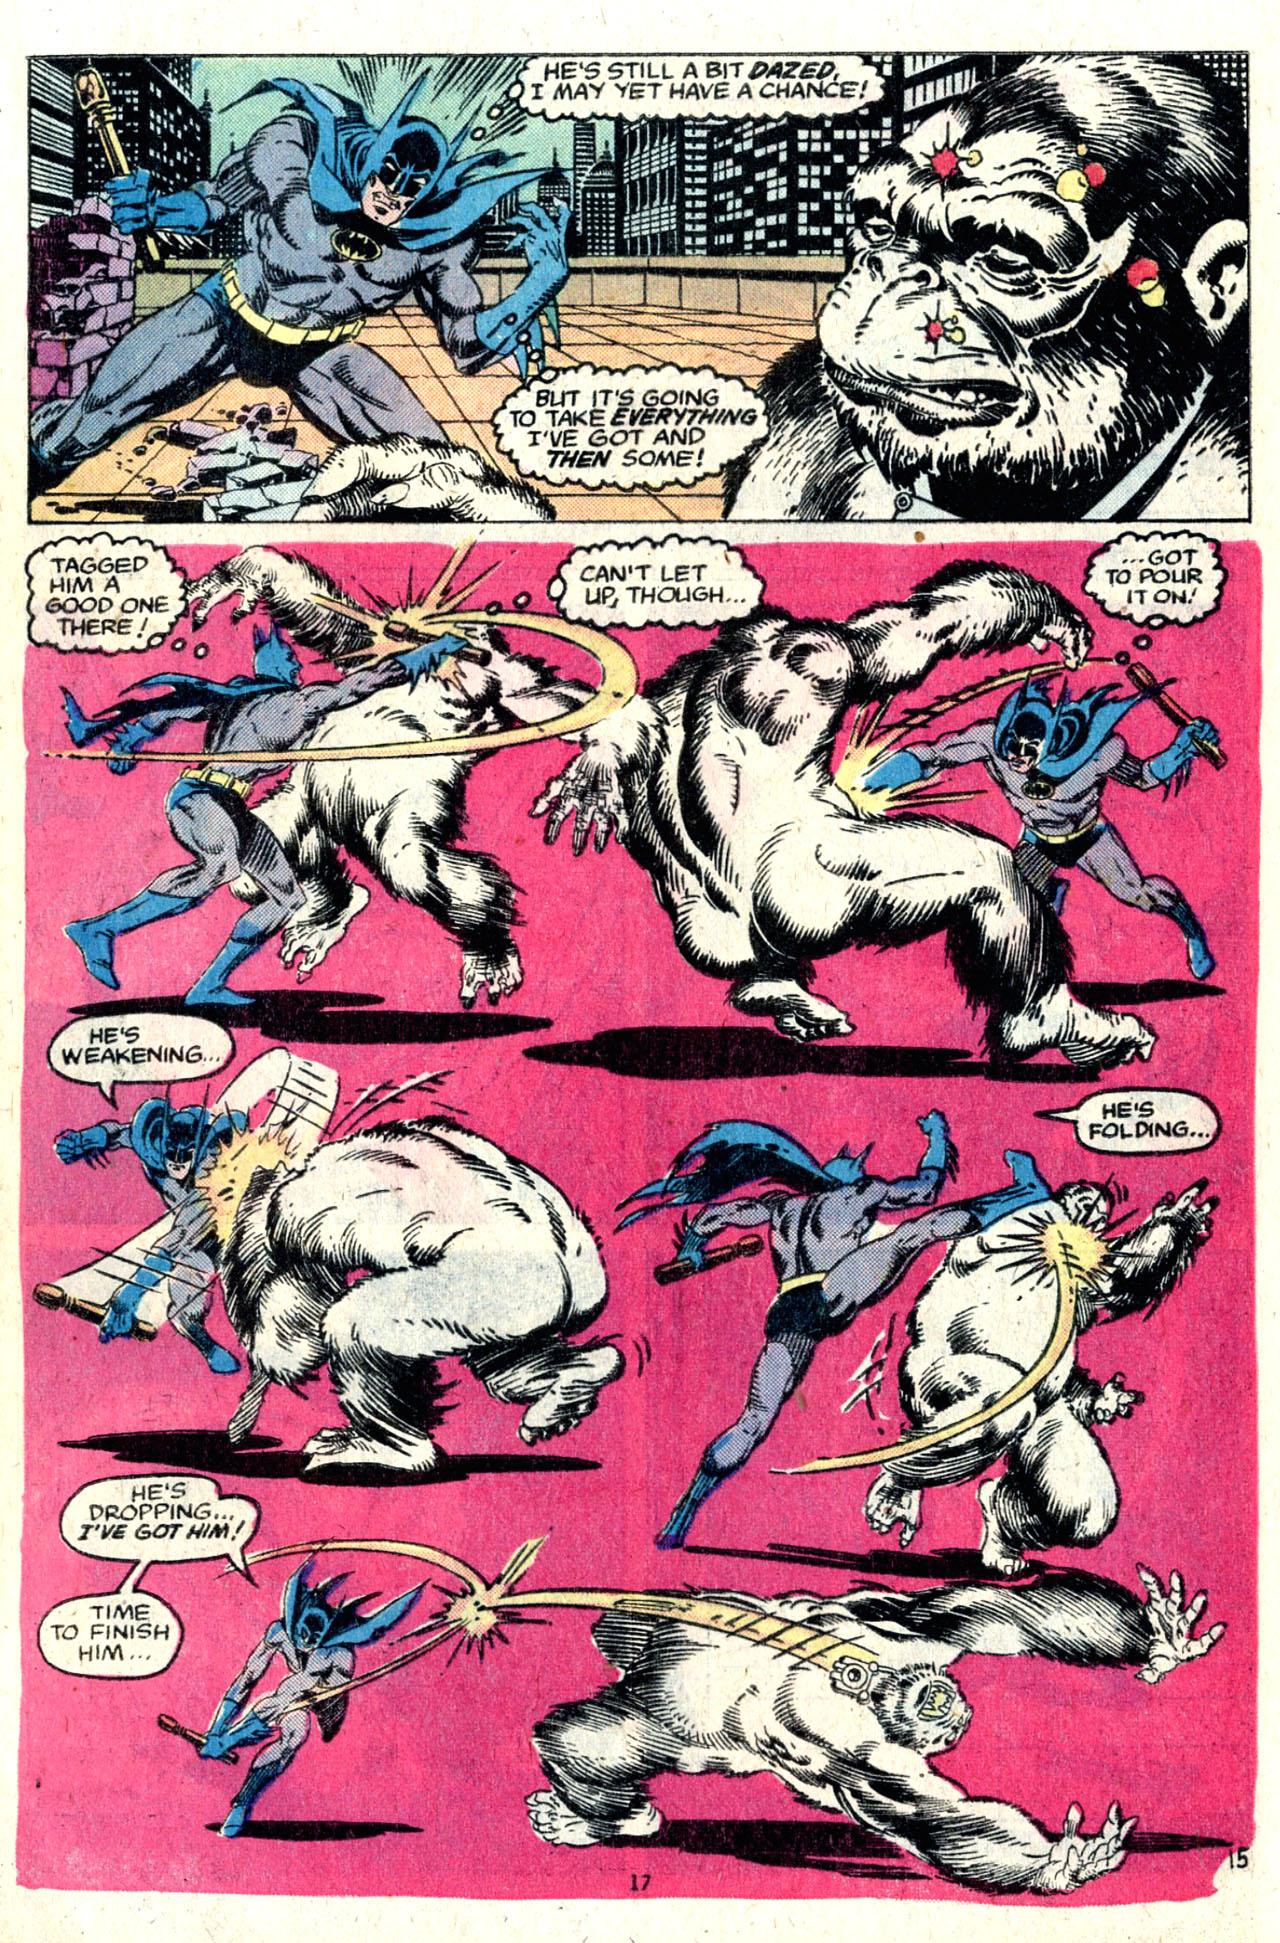 Detective Comics (1937) 482 Page 17